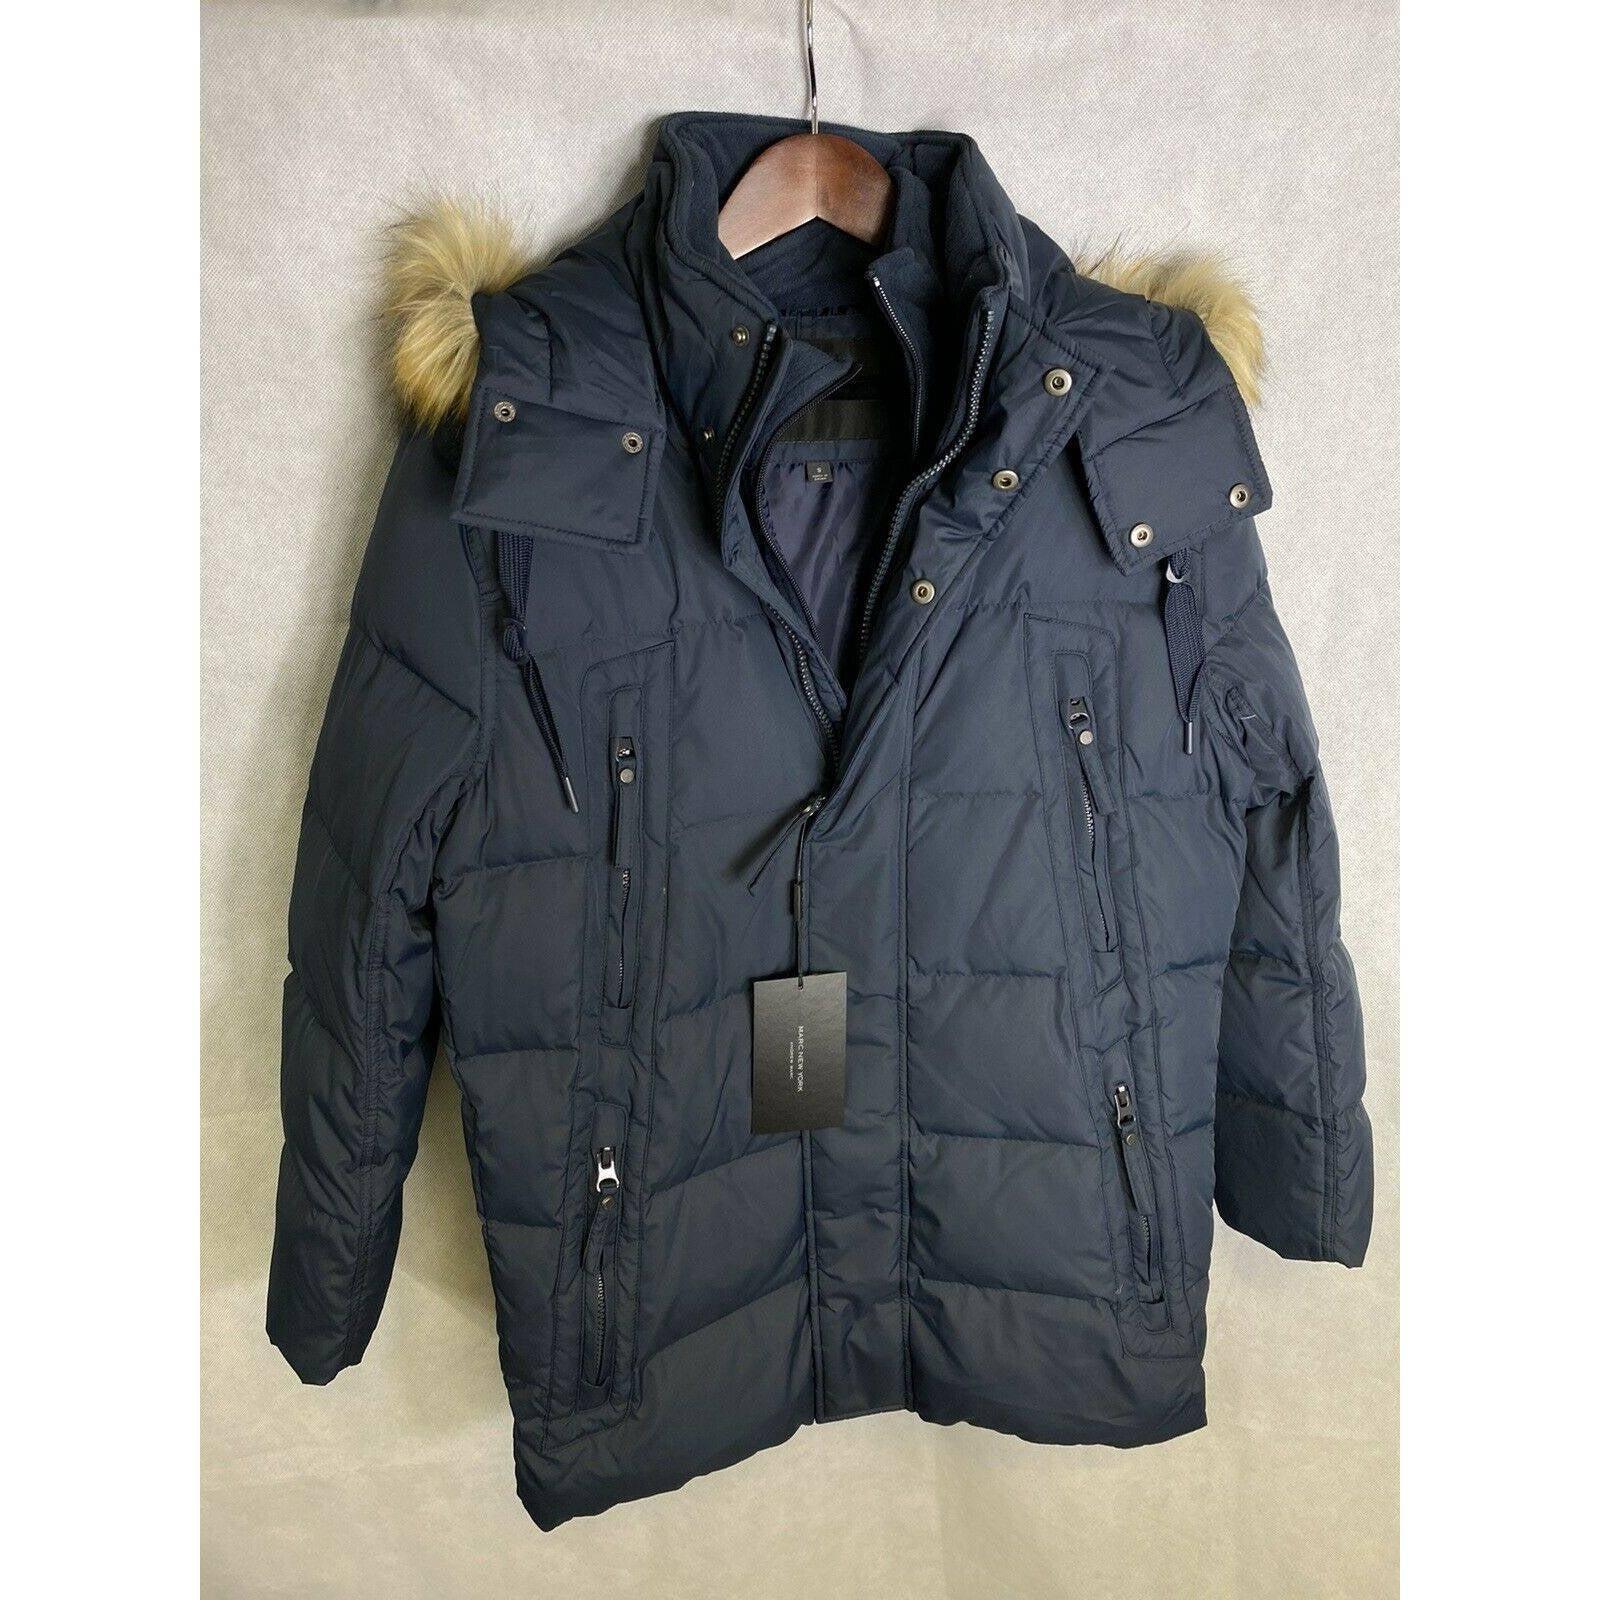 Marc New York Men's Jacket Navy Blue S